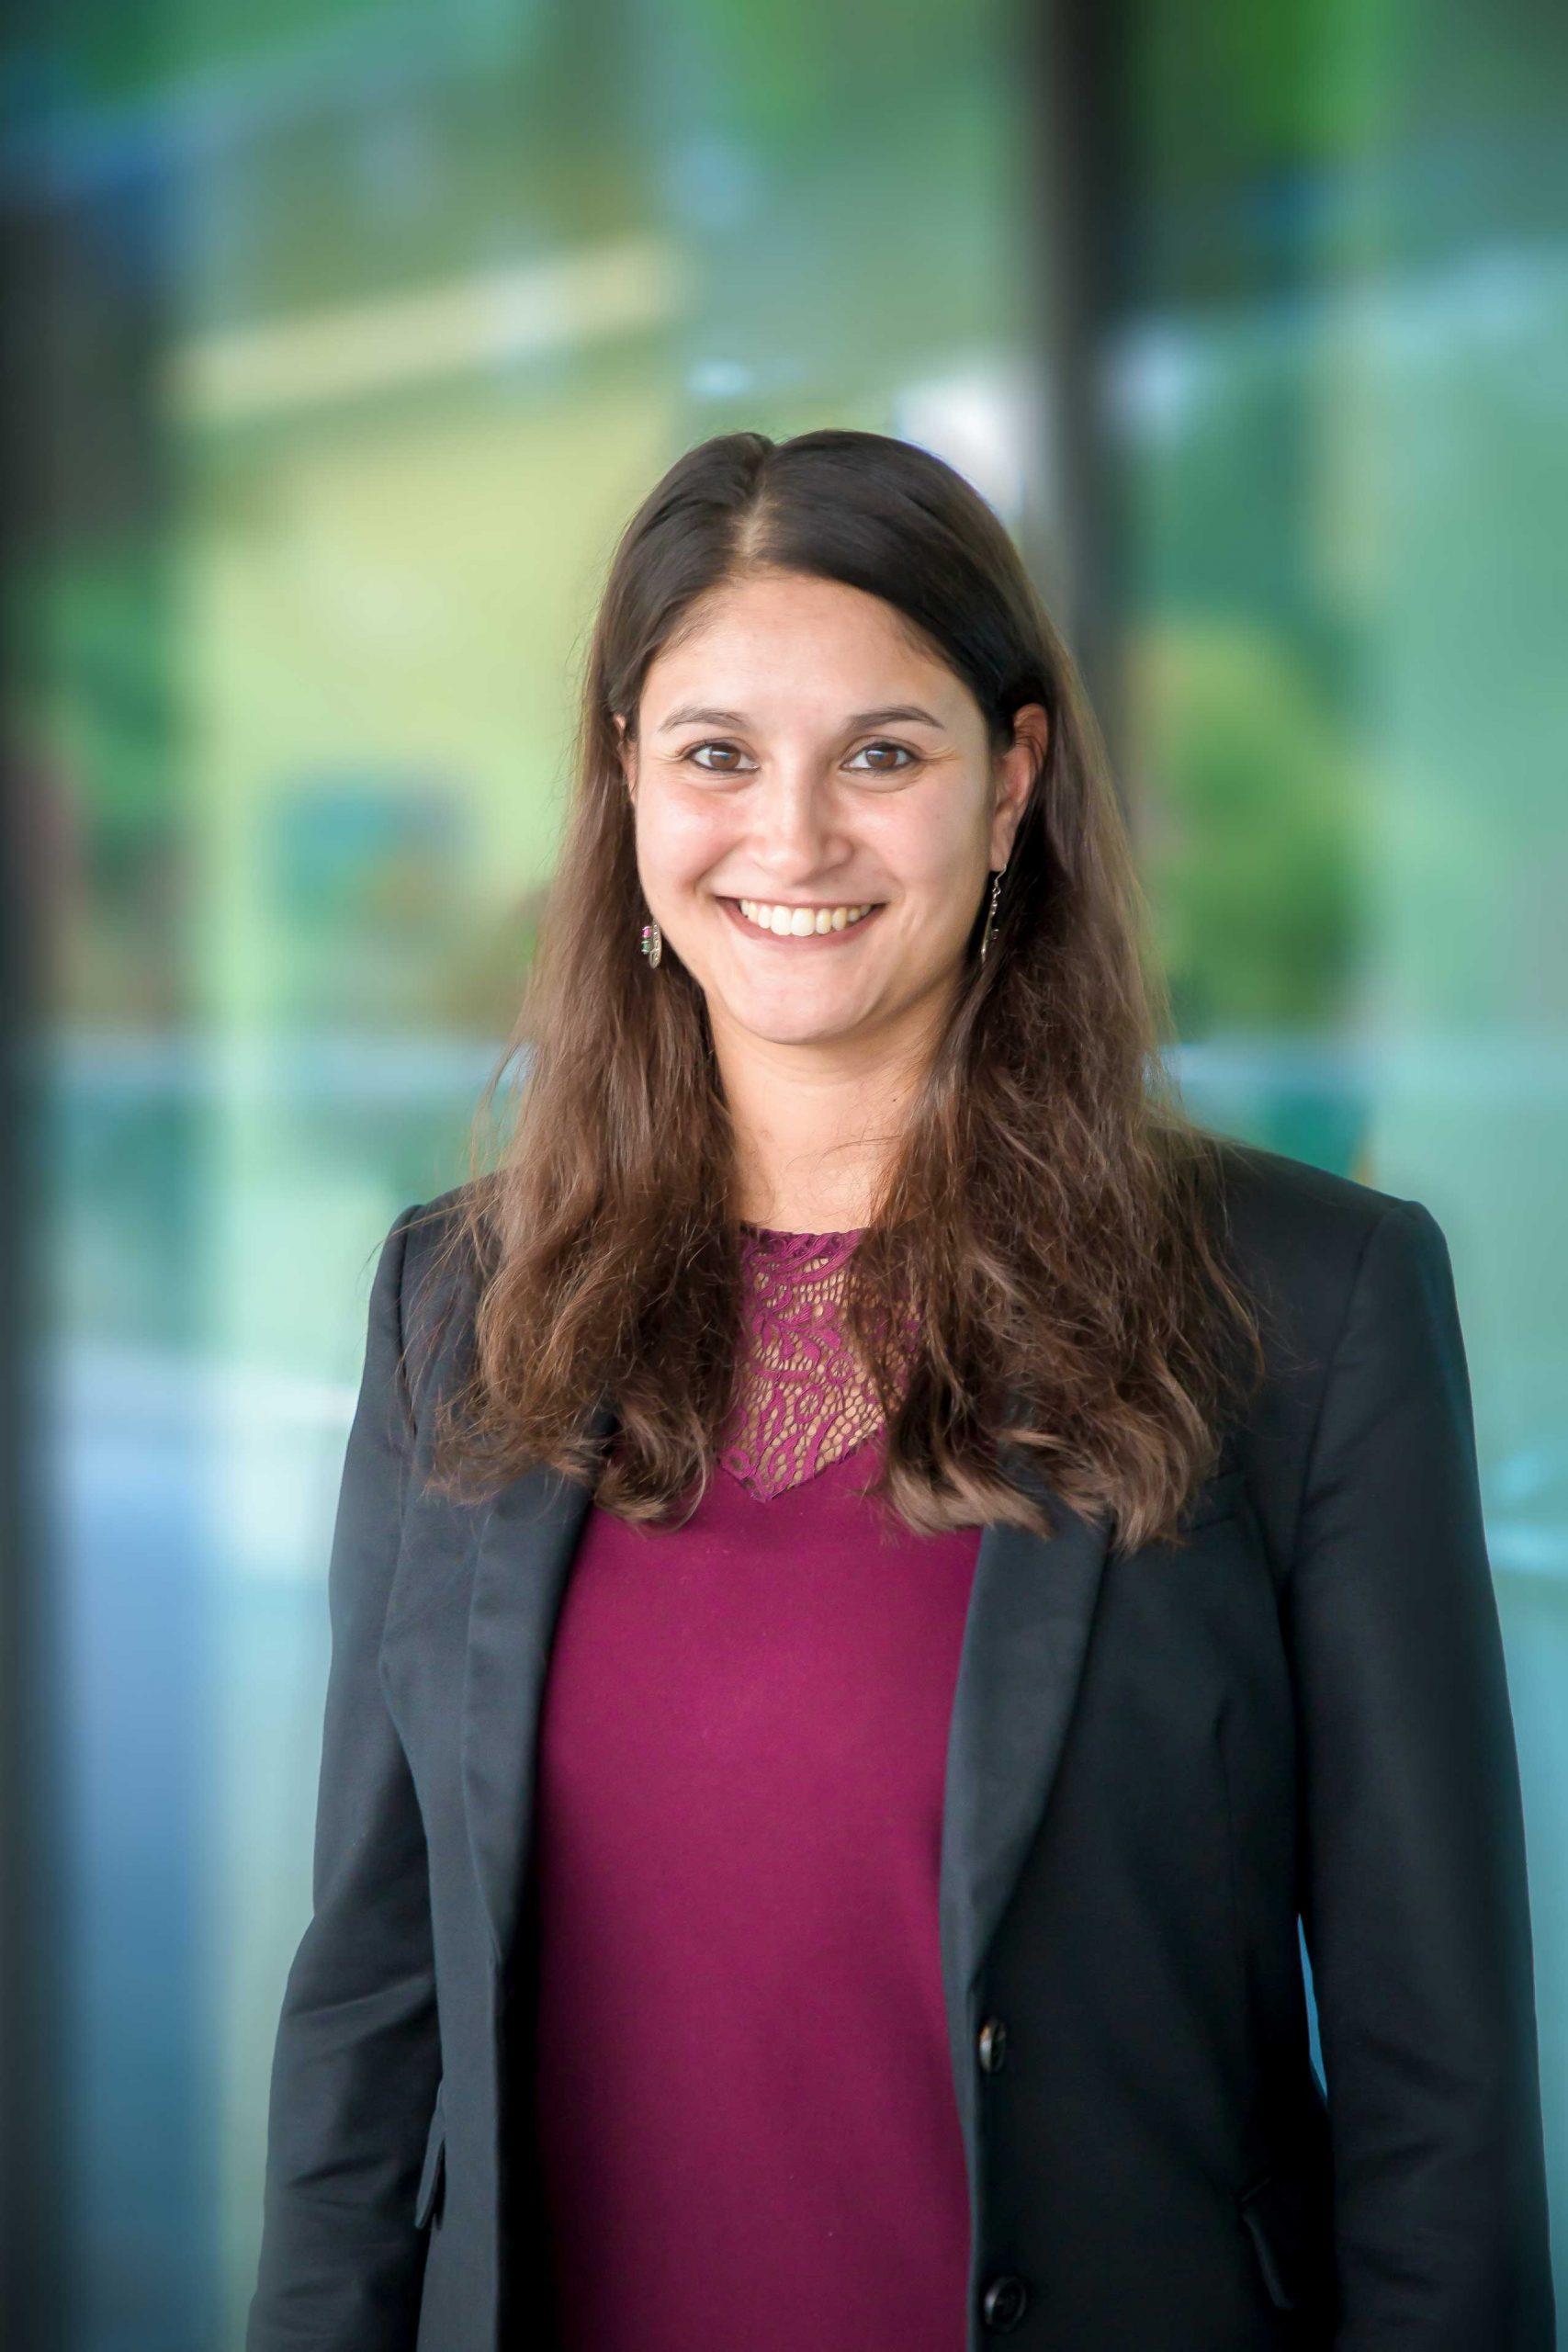 Daniela Hobscheidt Expertin Arbeit 4.0